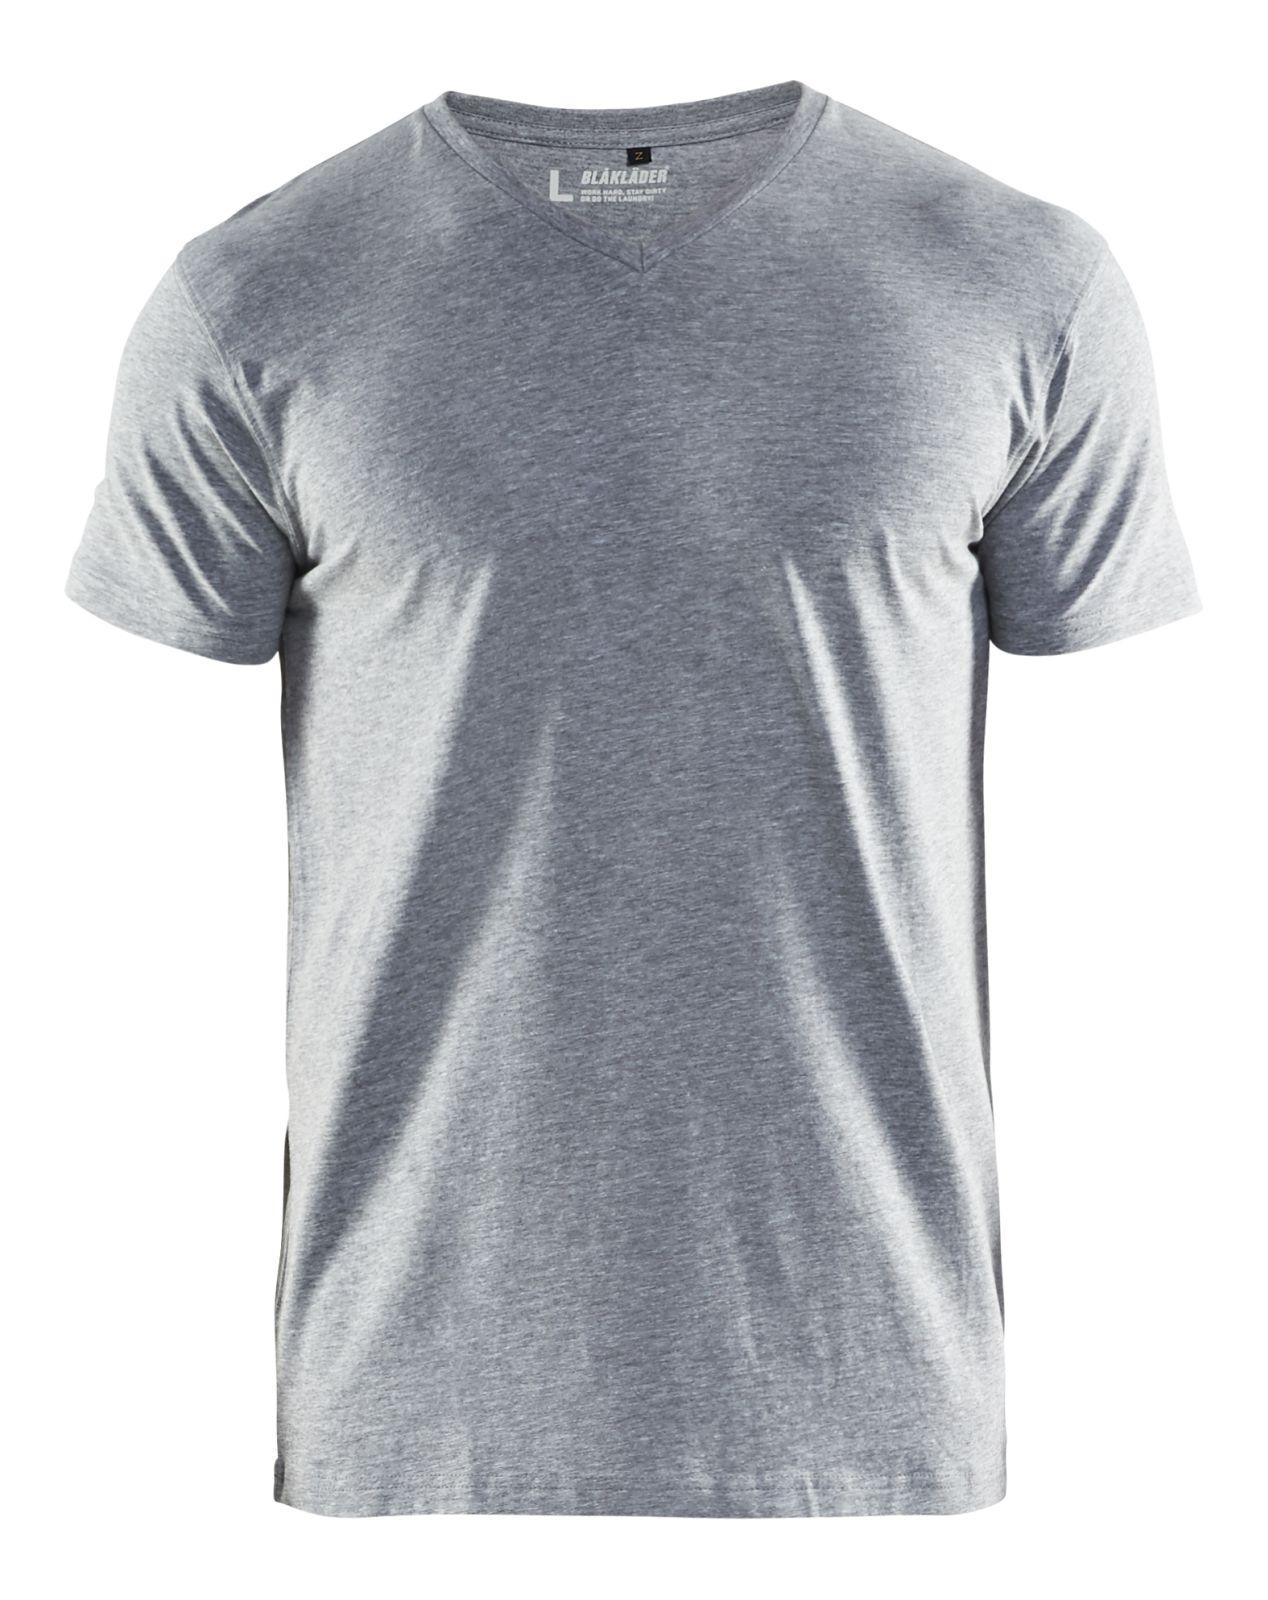 Blaklader T-shirts 33601059 grijs melee(9000)